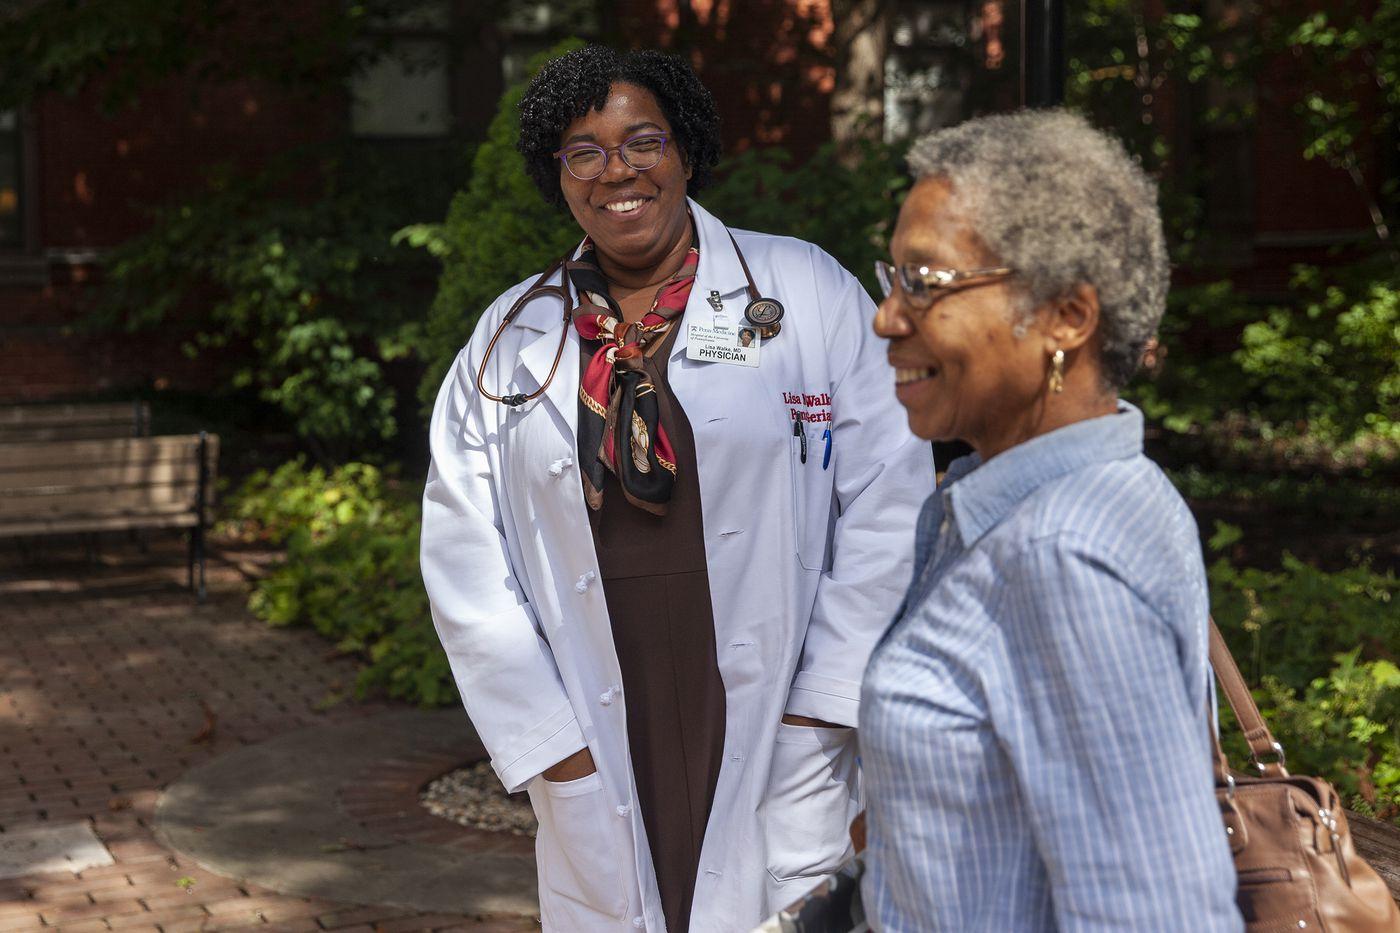 yantasylisaann_lisa walke speaks with patient mary ann lancaster tyler outside